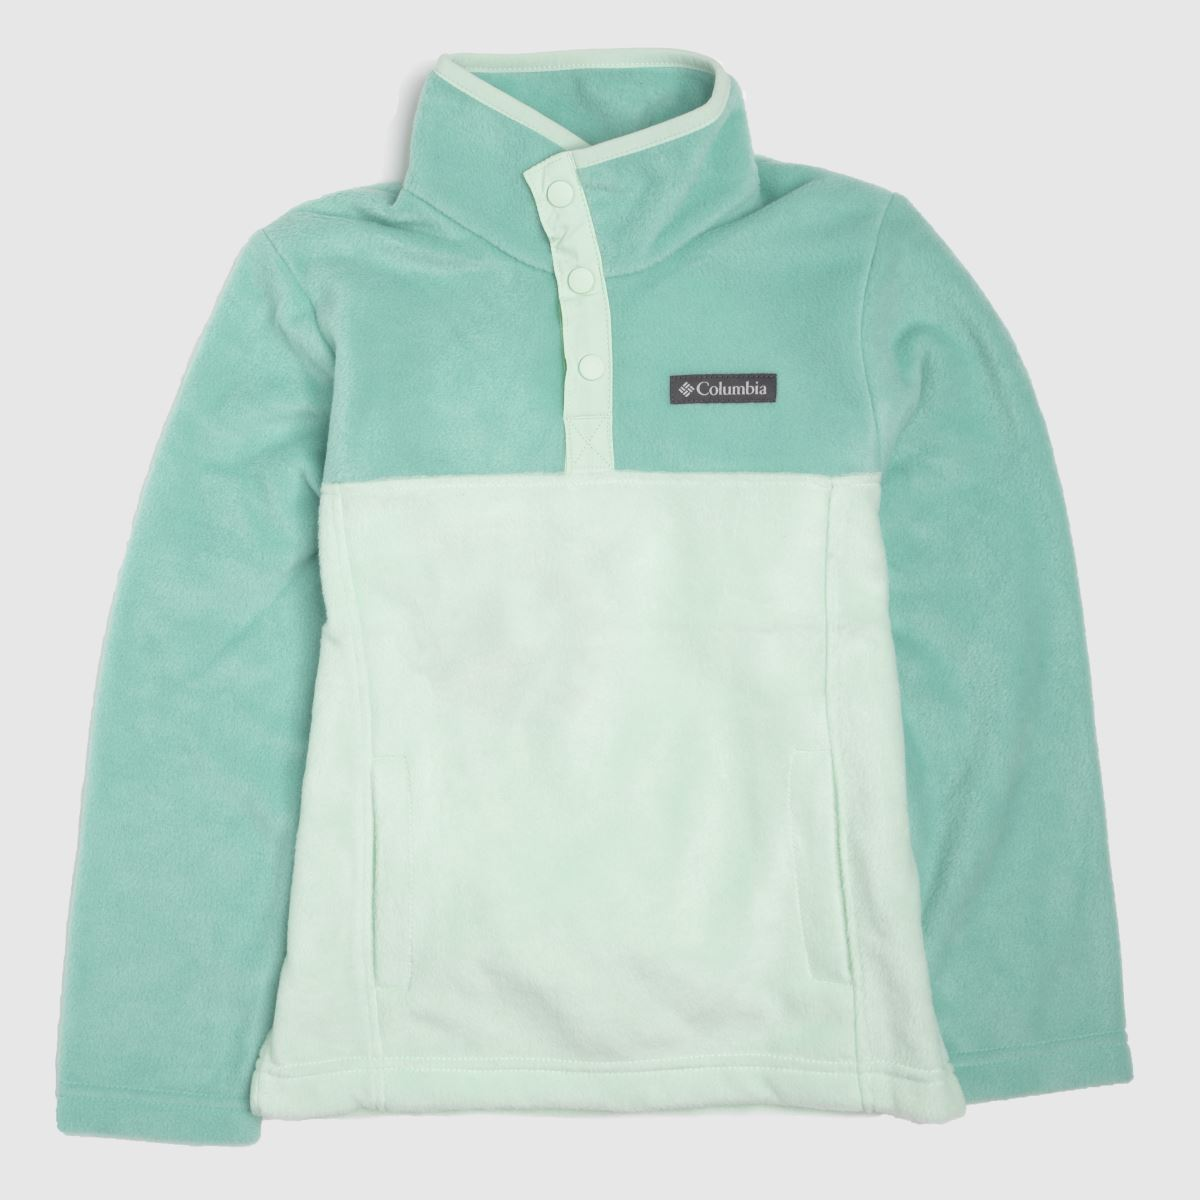 Columbia  Turquoise Kids Fleece Half Zip